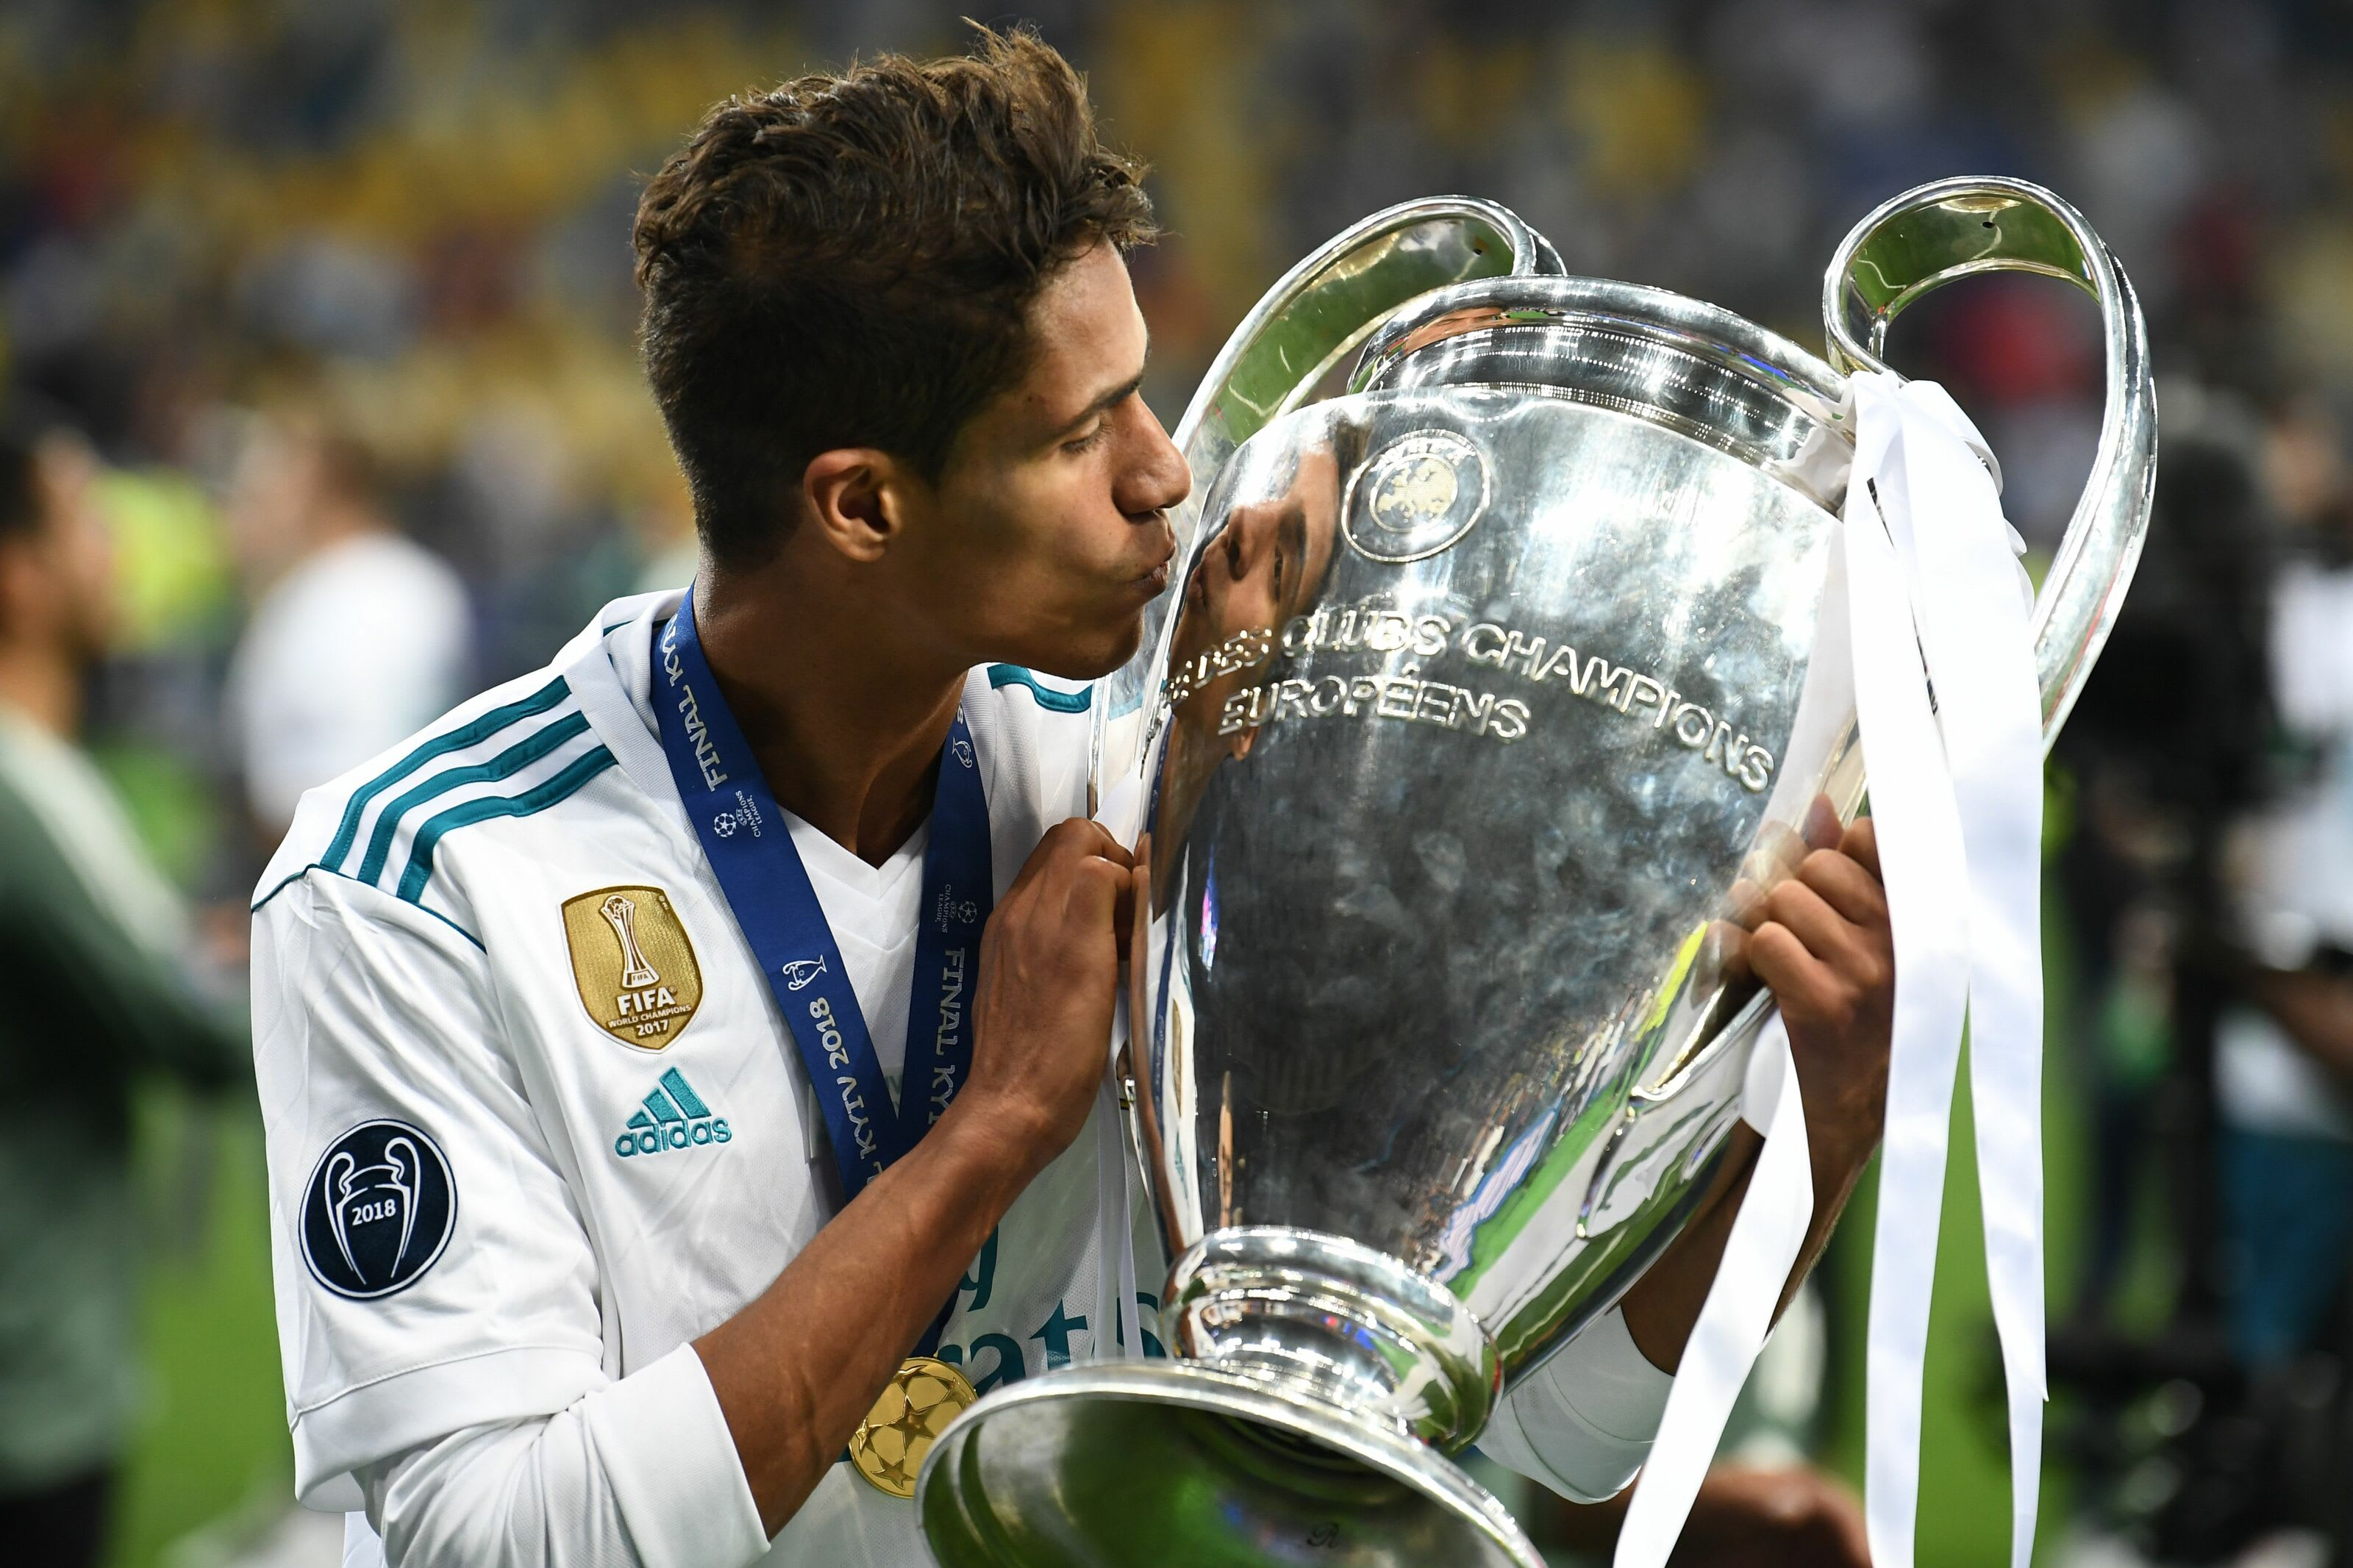 Real Madrid: Three things Florentino Pérez must rectify